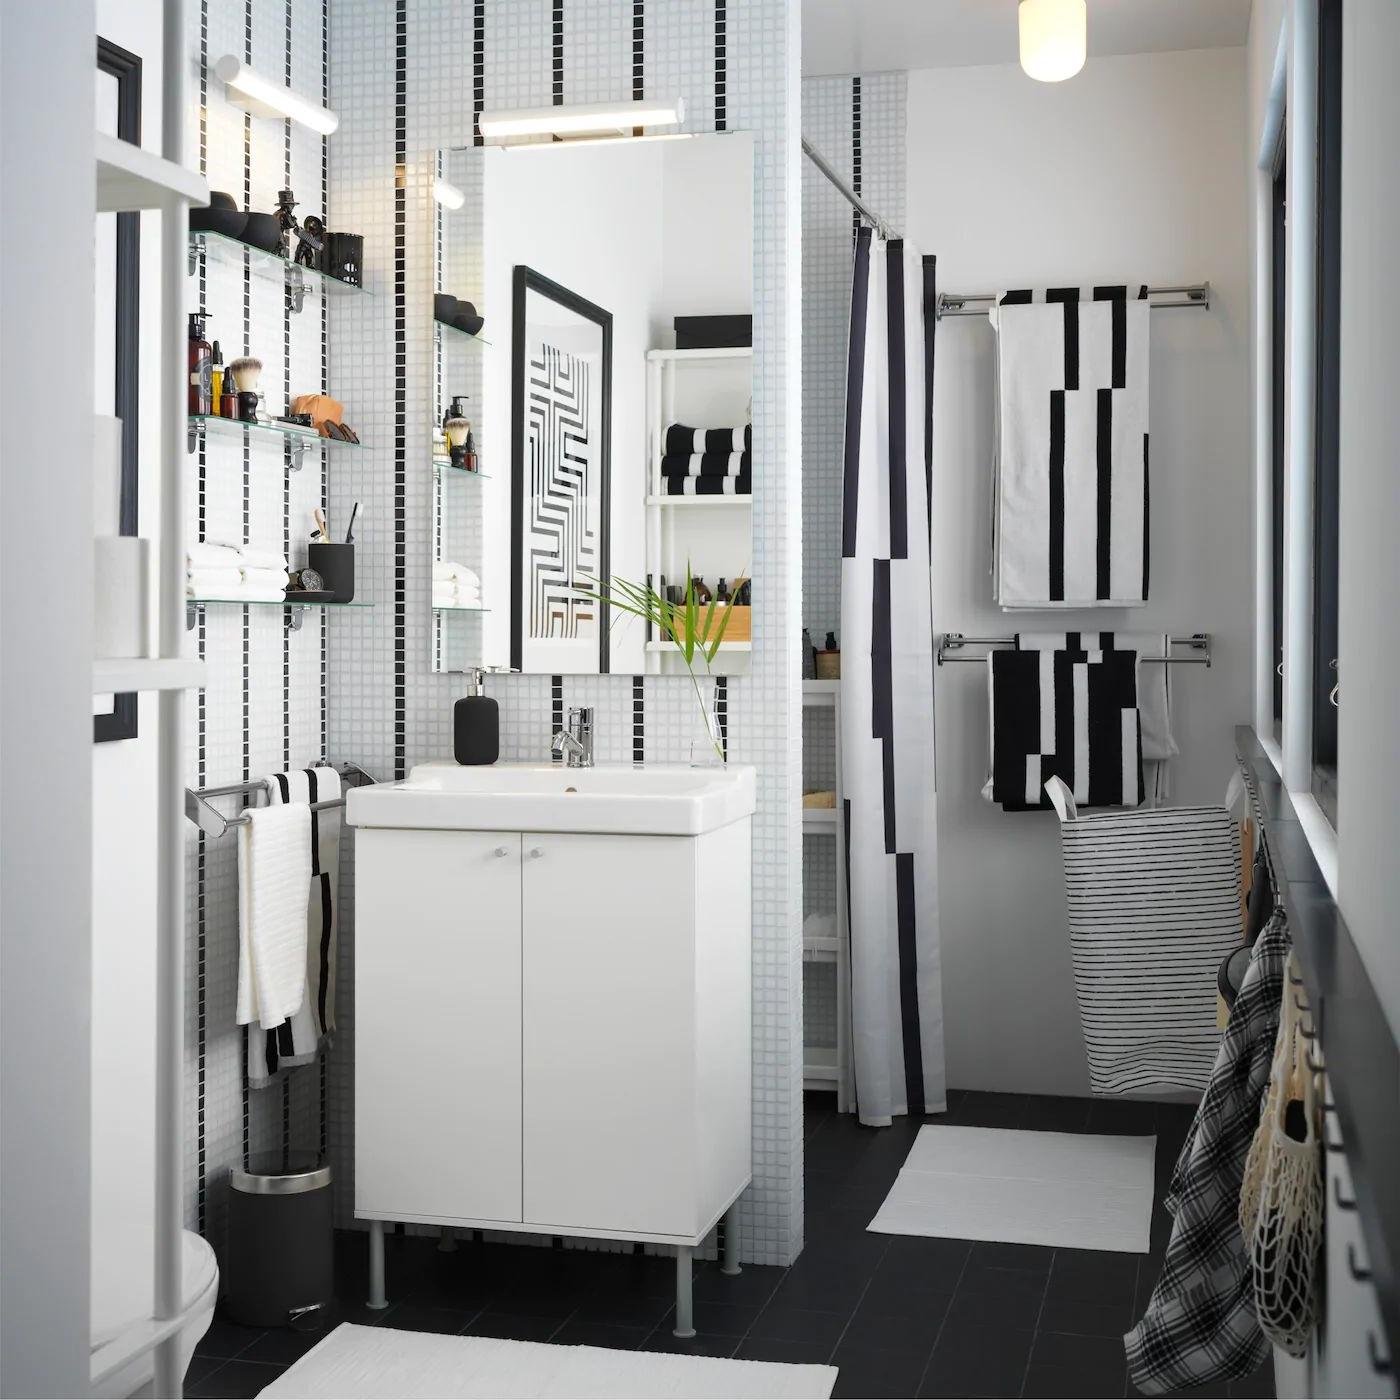 Une Salle De Bain Scandinave En Noir Et Blanc